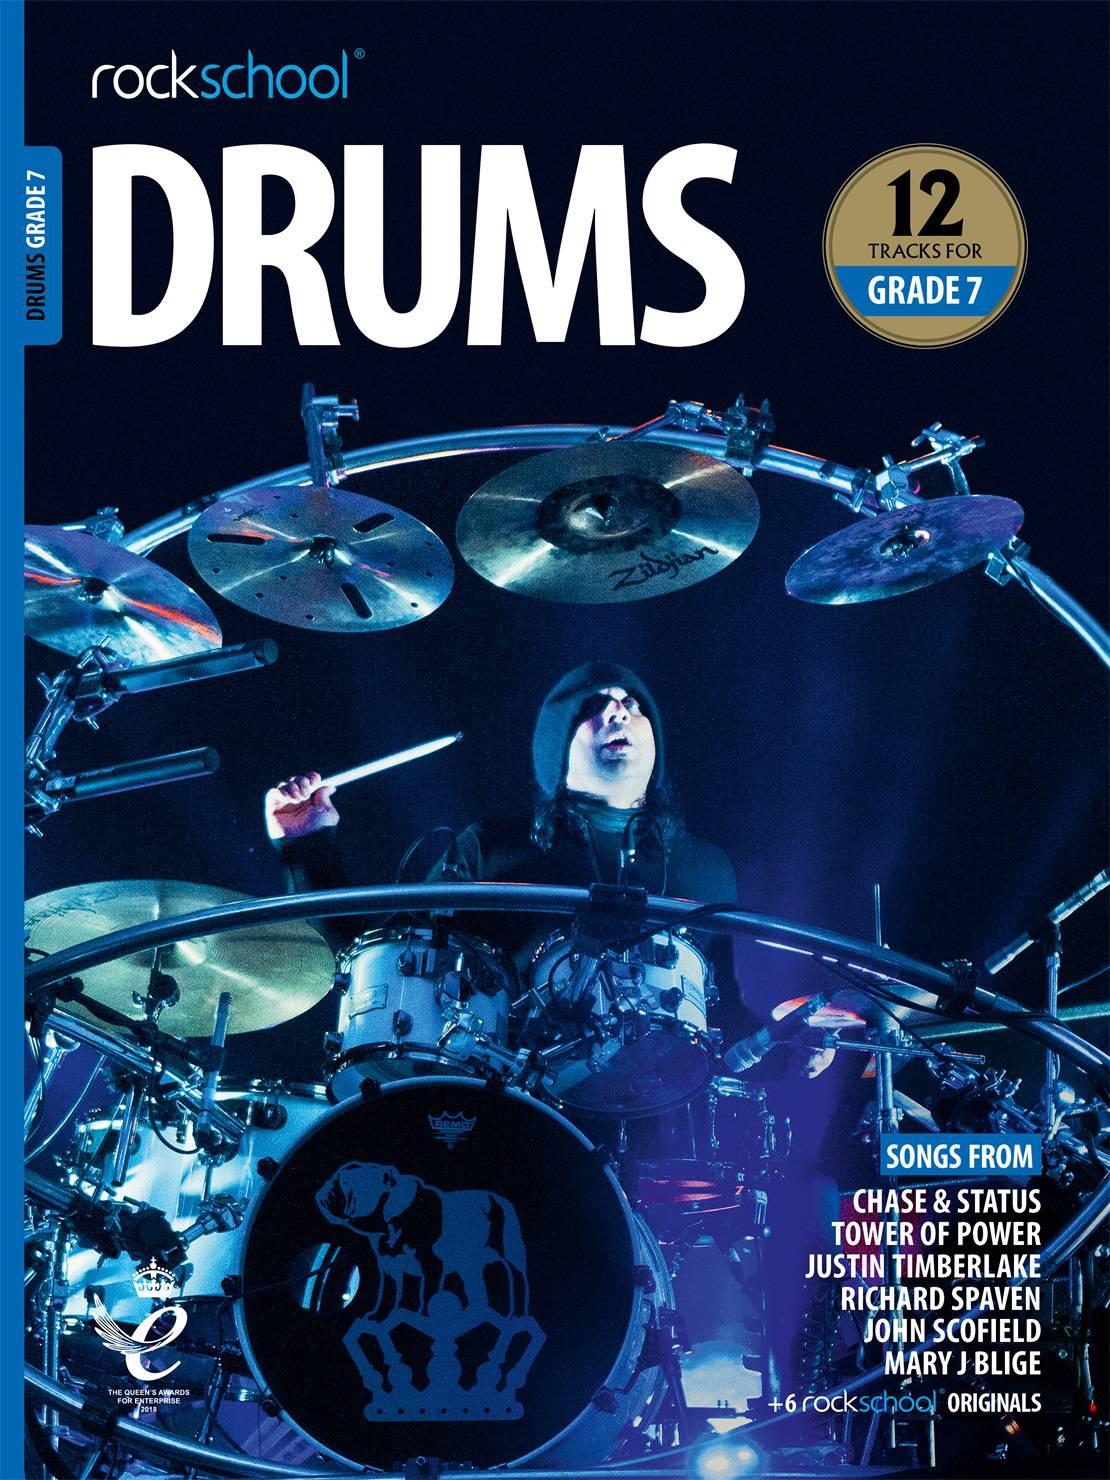 Rockschool - Shop - Drums Grade 7 | RSL